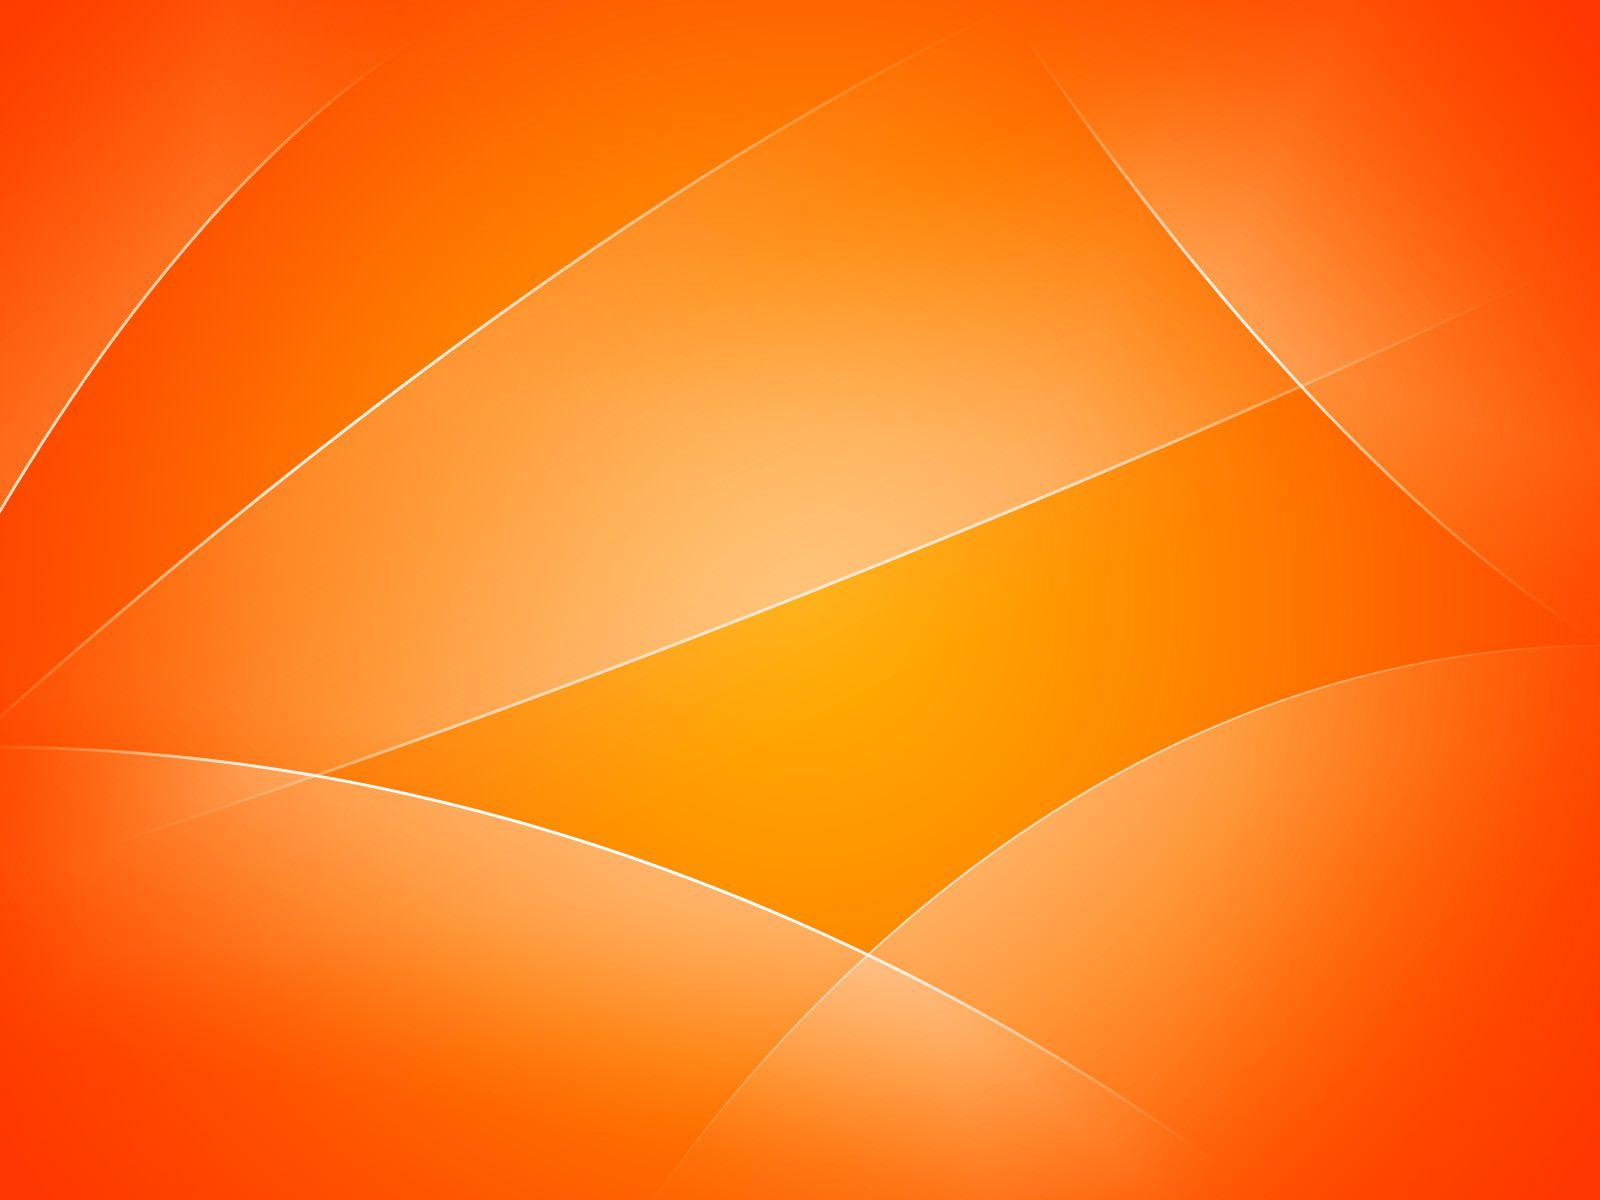 Cool Orange Wallpapers Orange Wallpaper Orange Background Iphone Wallpaper Orange Iphone orange colour hd wallpaper for